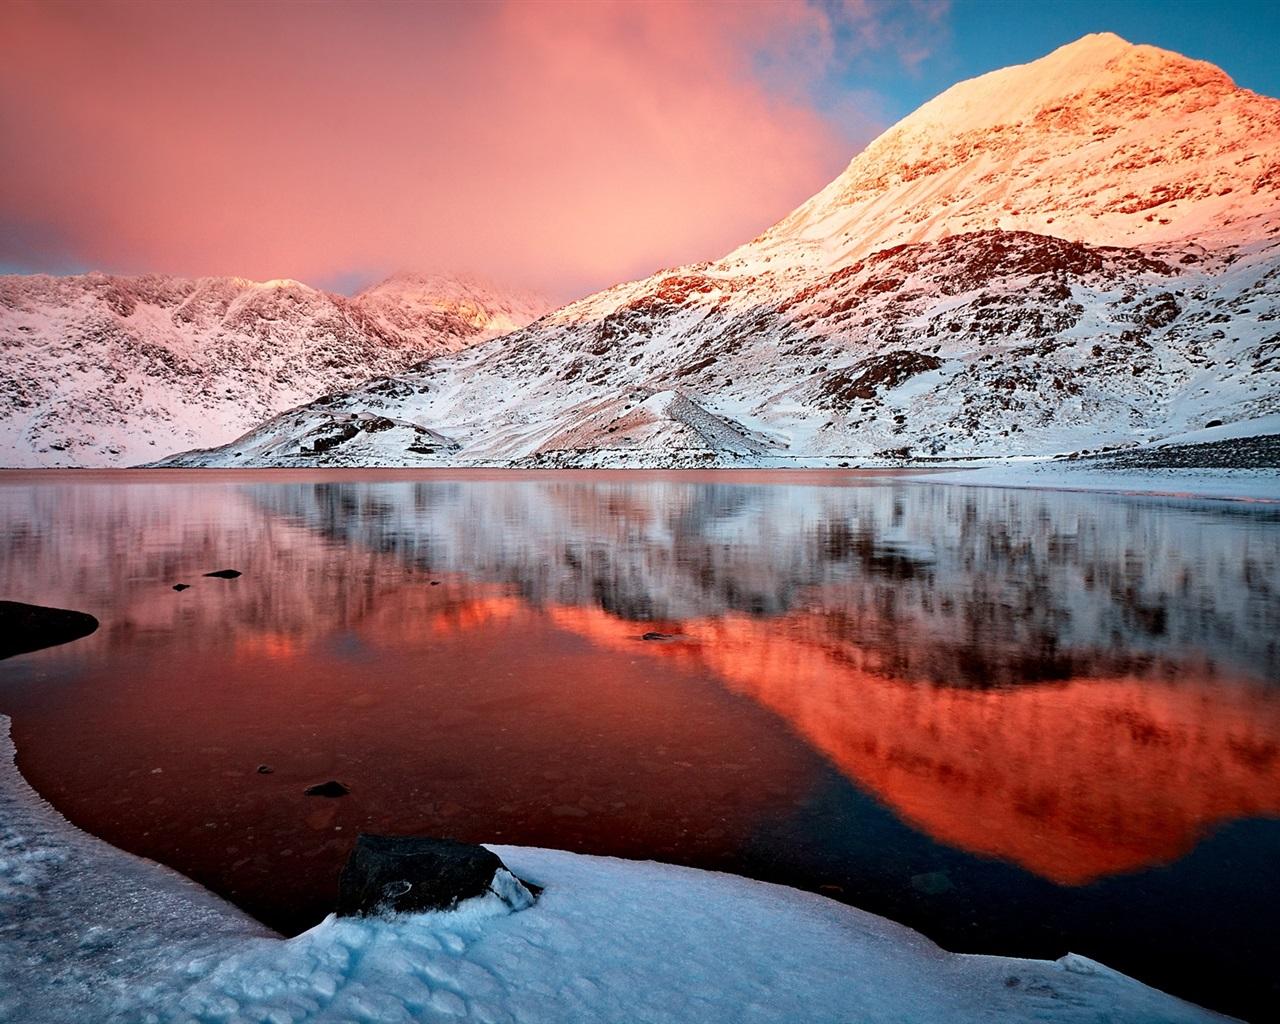 Fondos De Pantalla Montaña, Nieve, Invierno, Lago